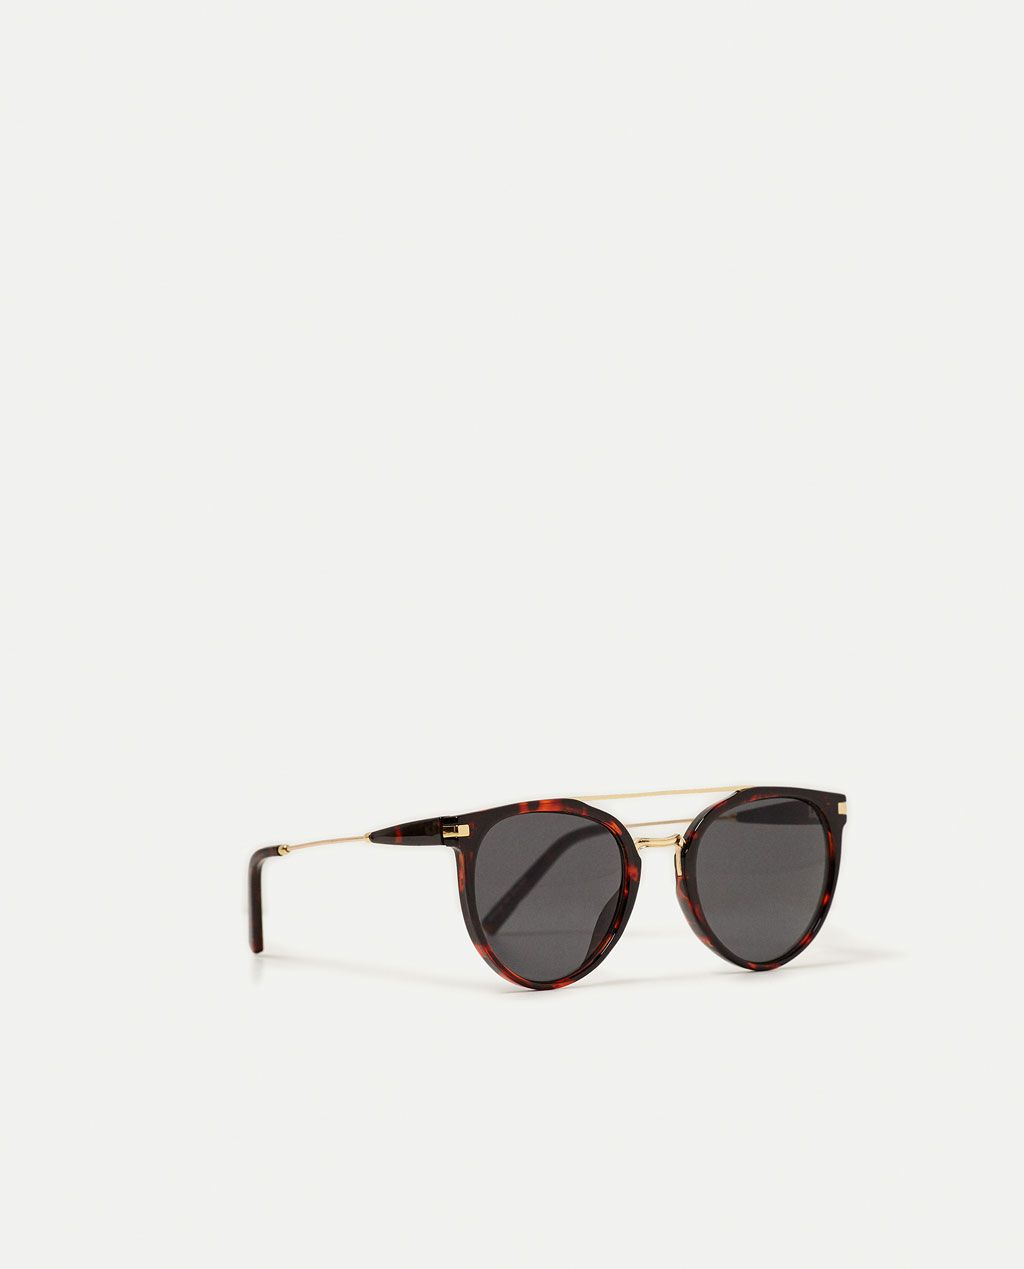 658c857cca GAFAS SOL DOBLE PUENTE | denim x pleats x crossbody | Sunglasses ...